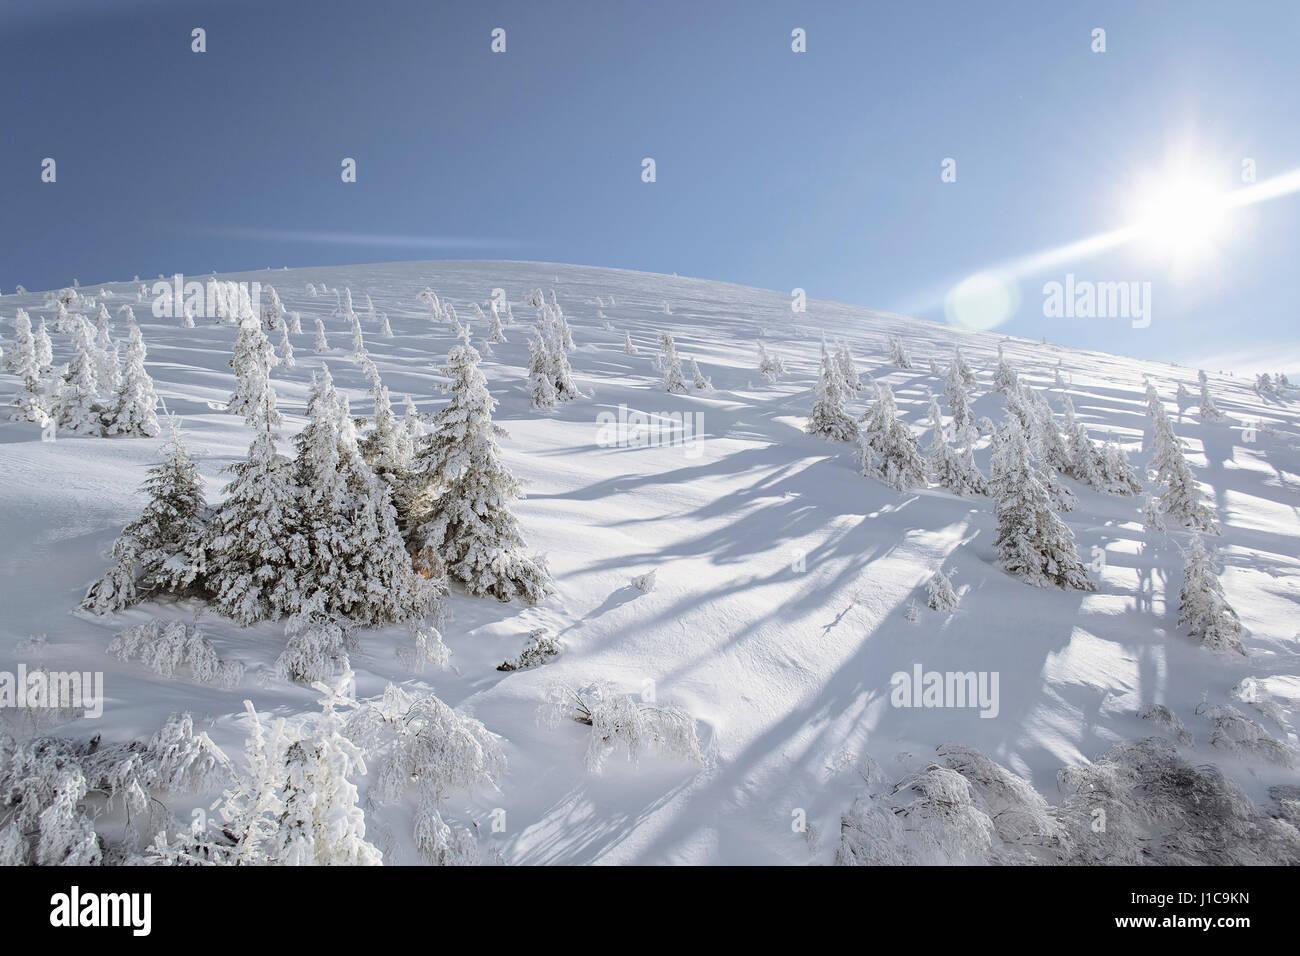 Snow on sunny mountain - Stock Image